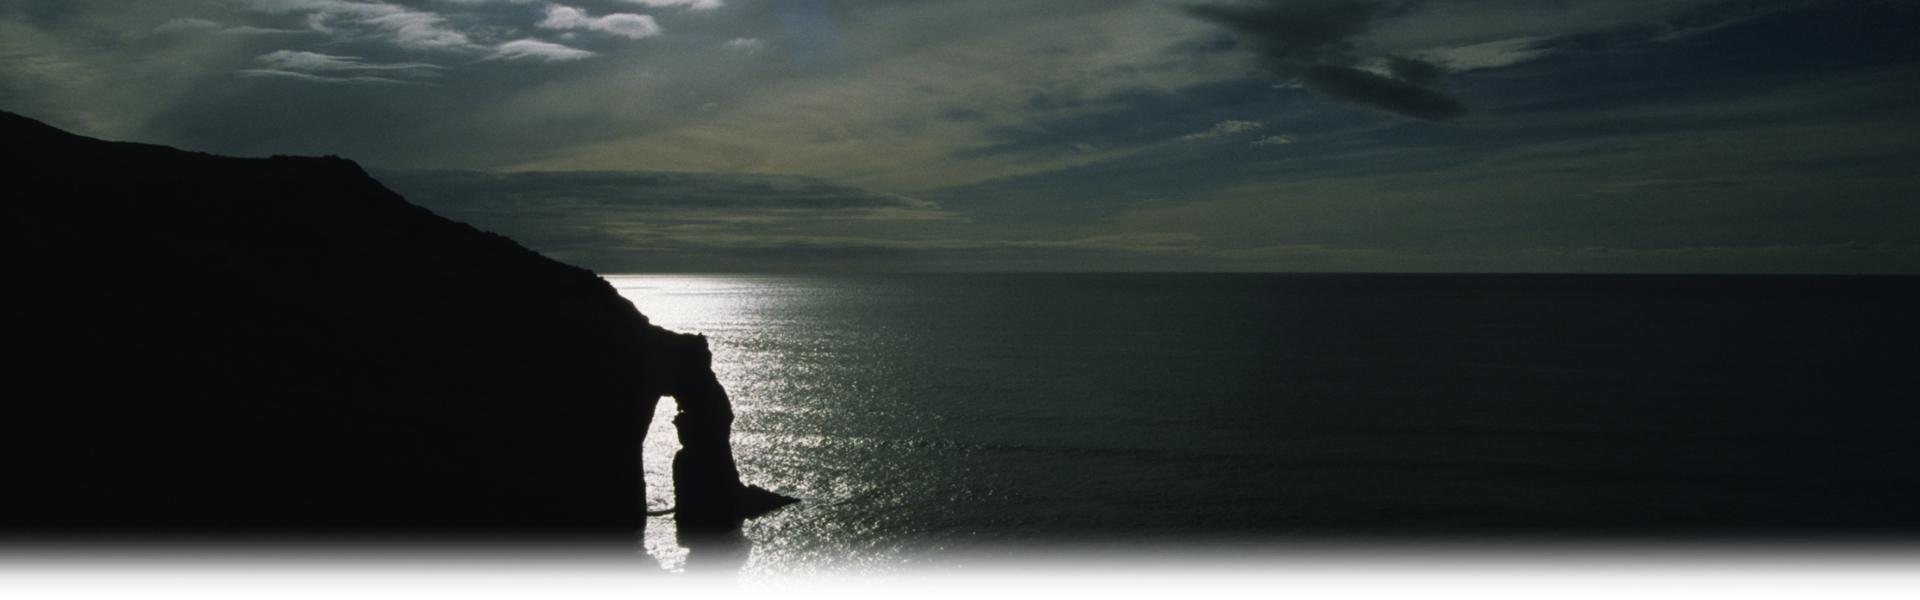 NZ Coastline